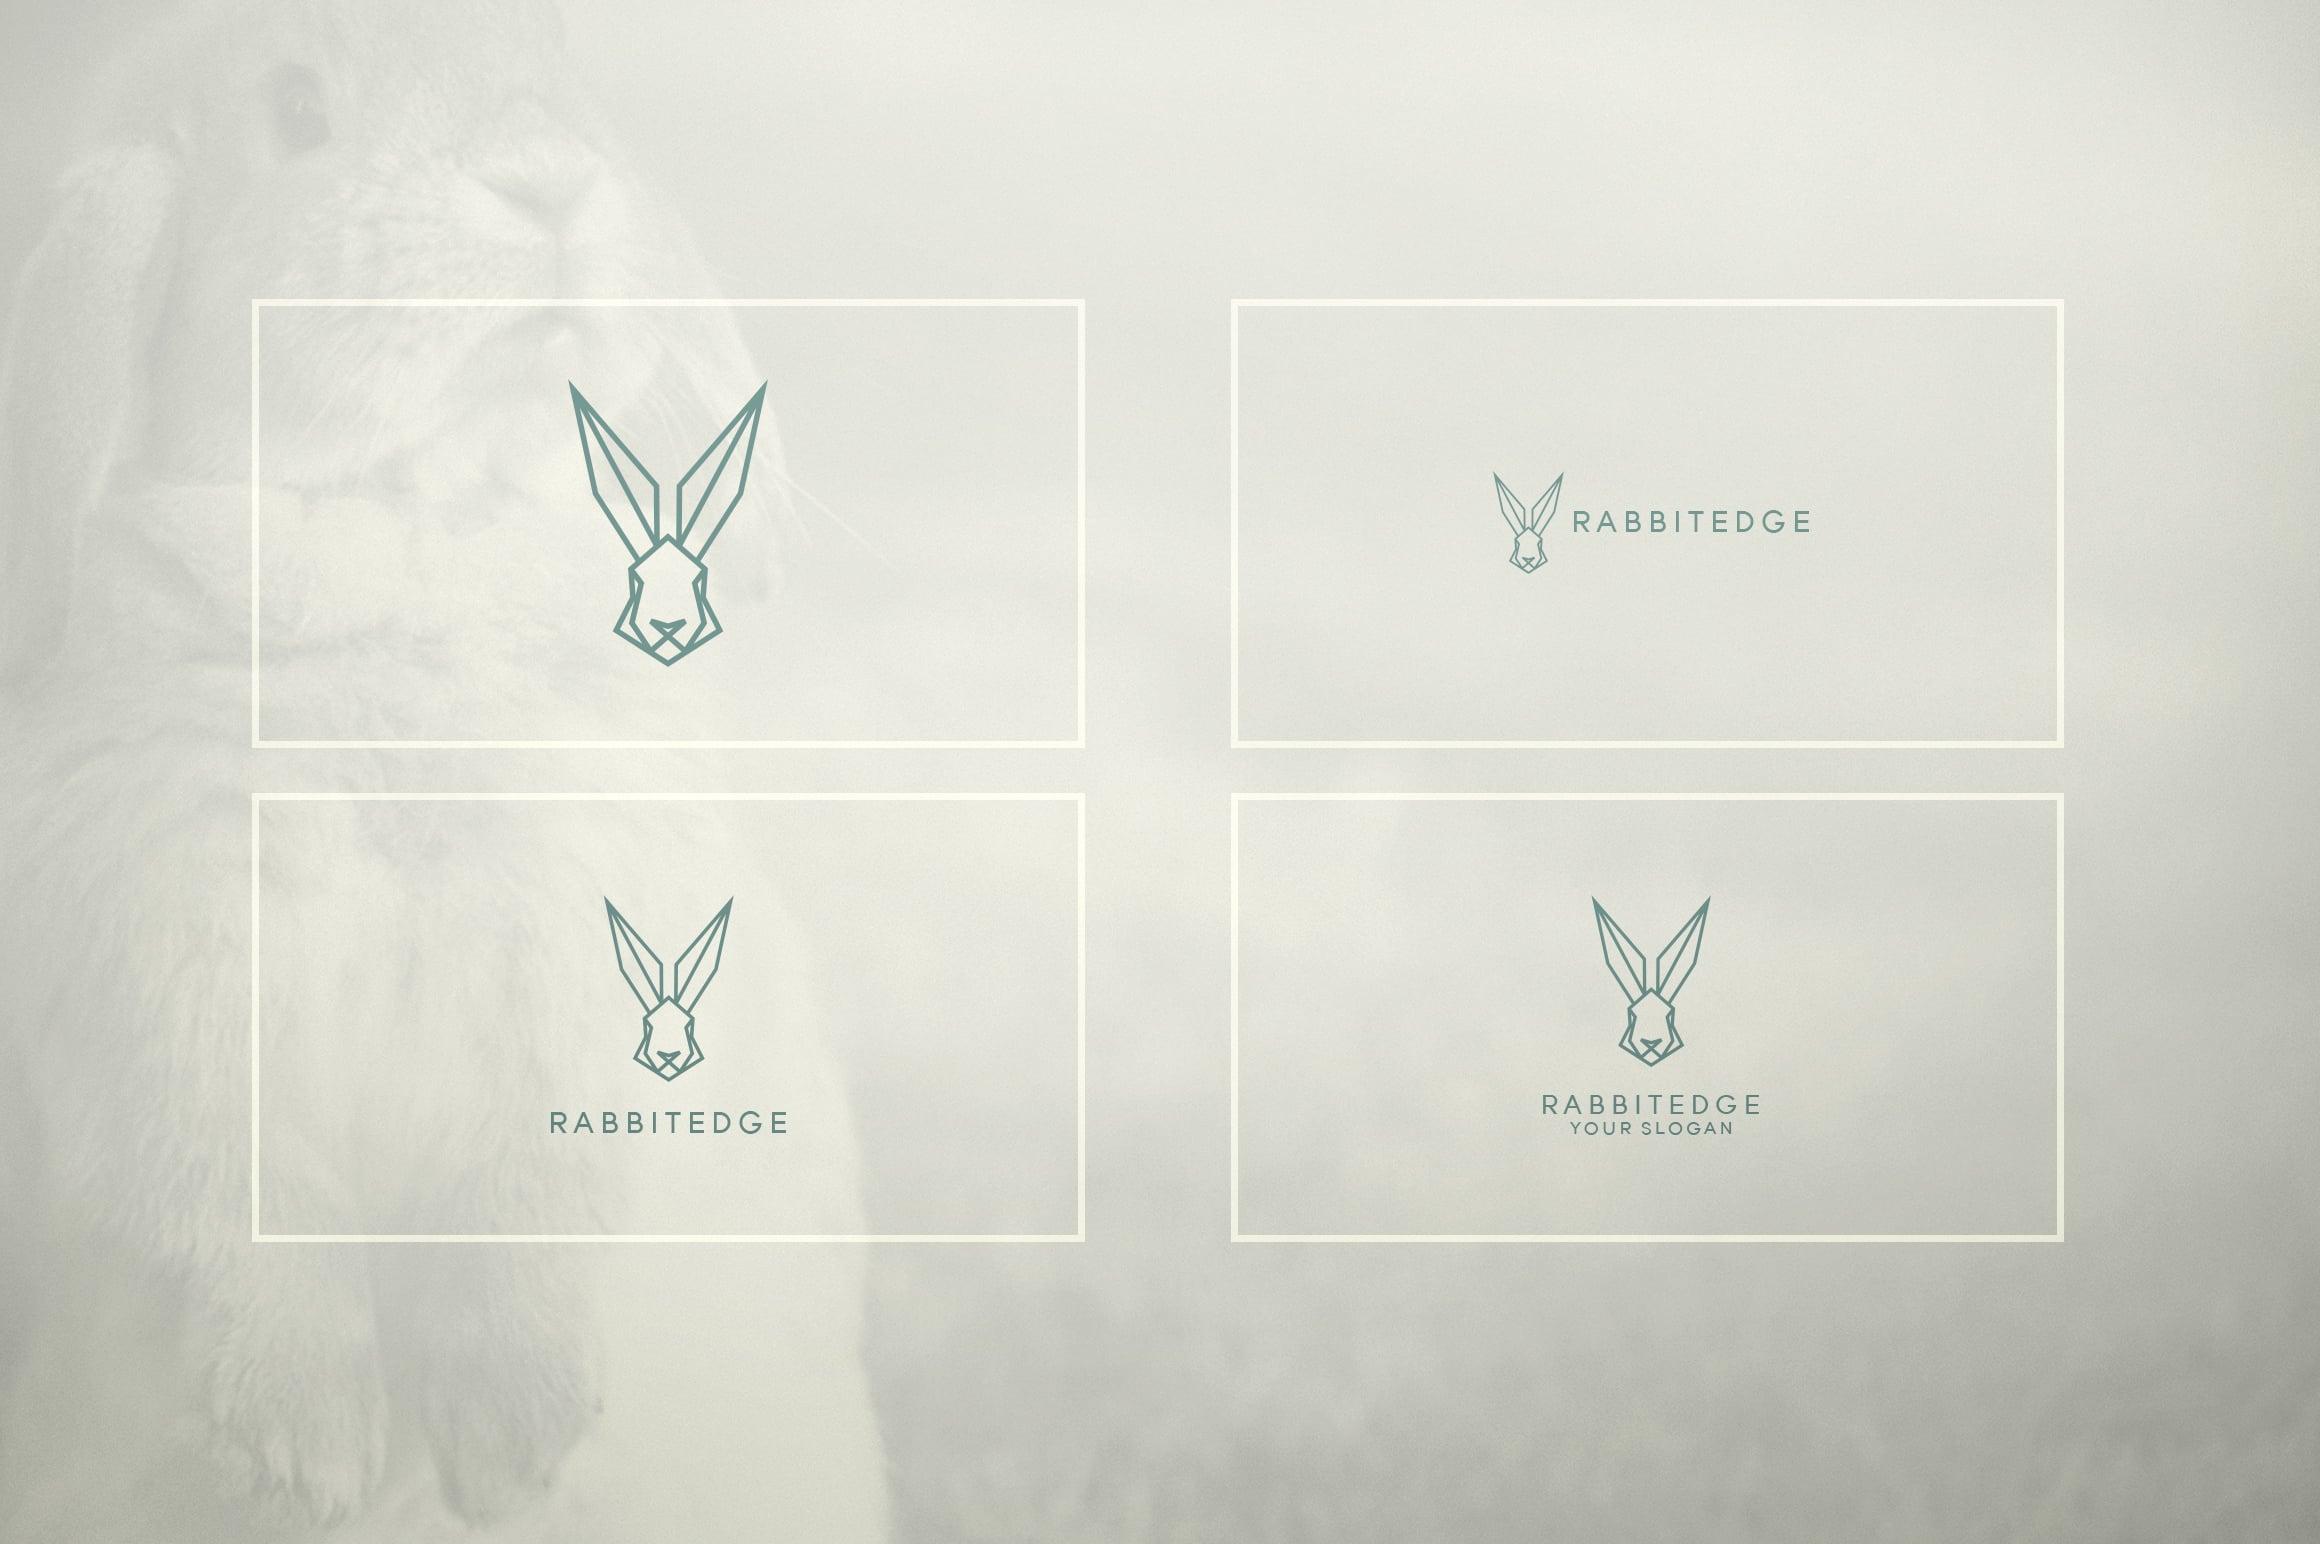 17 Geometric Animal Icons and Logos - 22